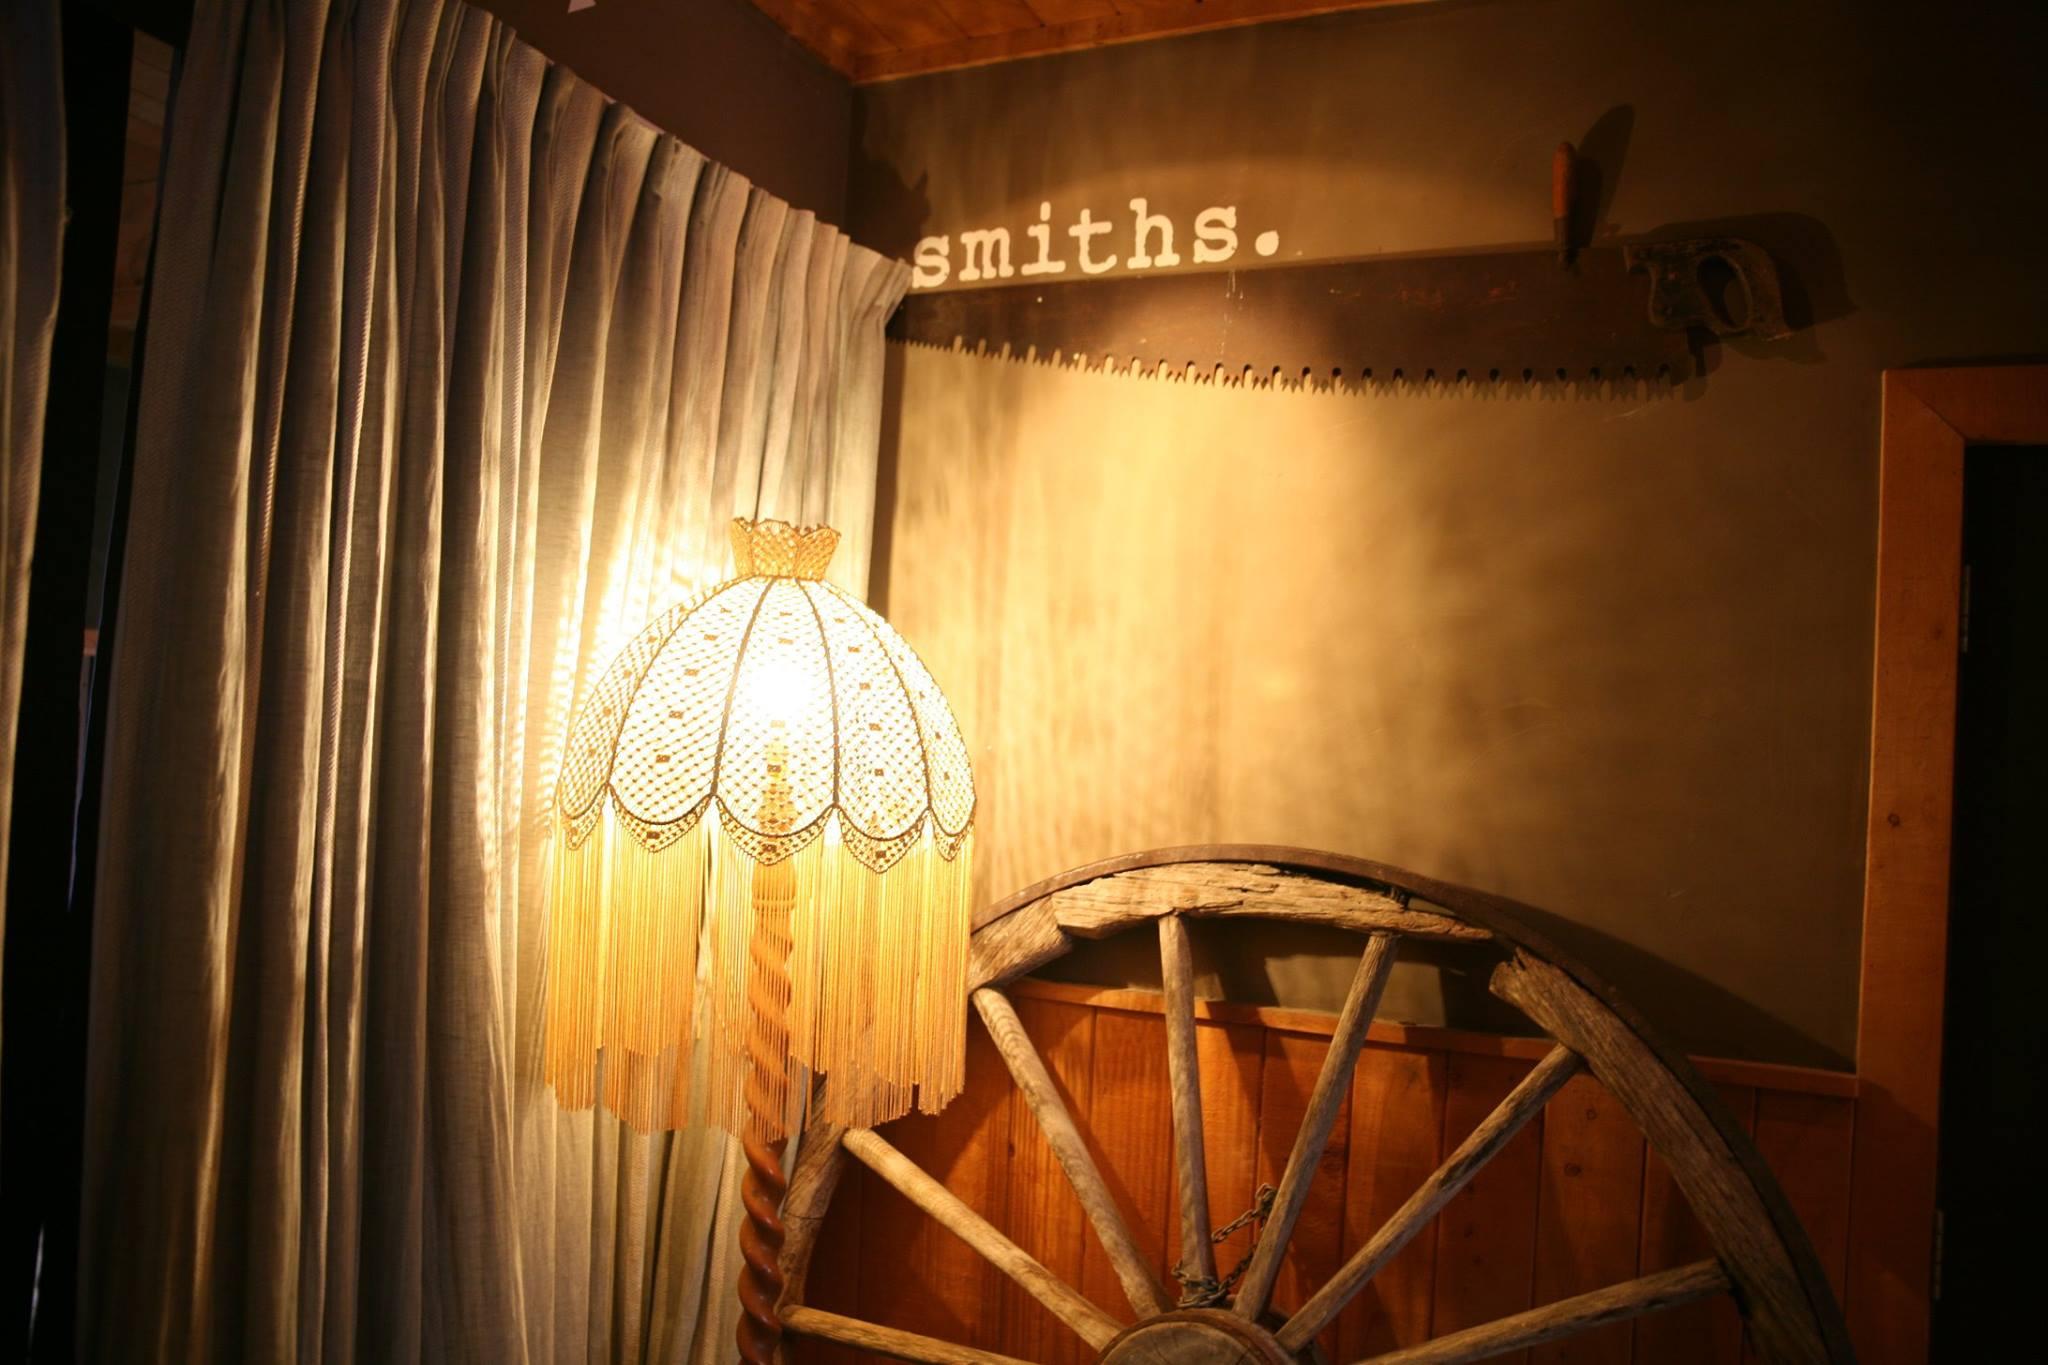 smiths lamp.jpg